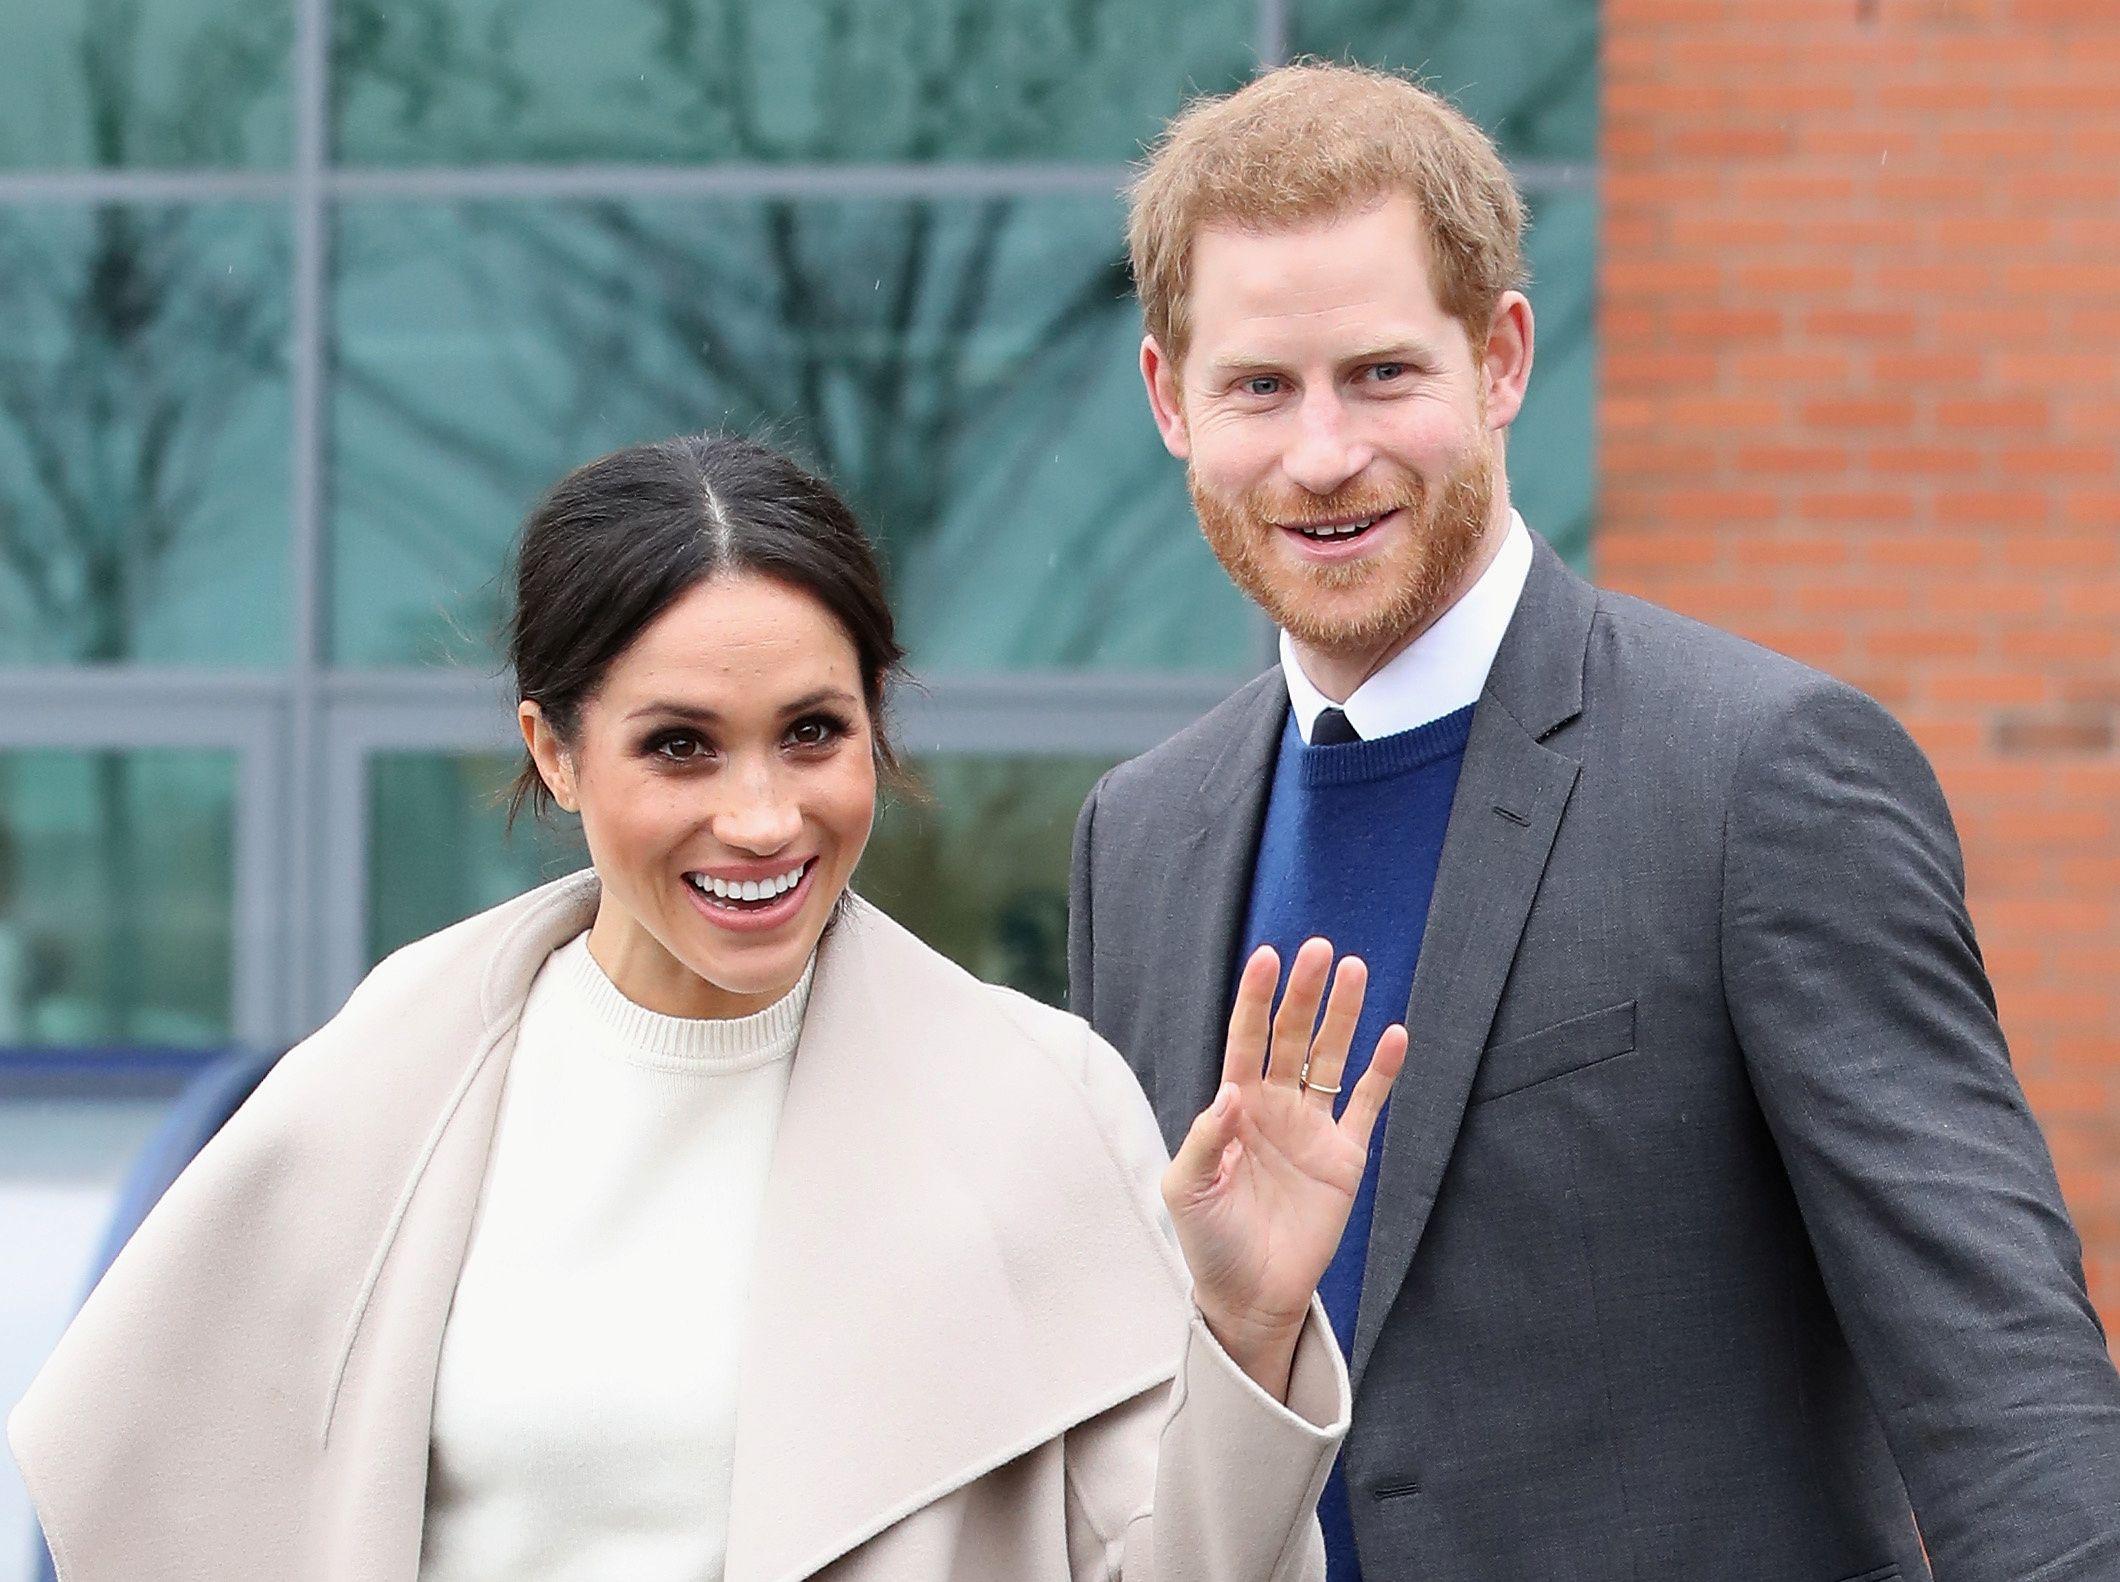 Trevor Rees Jones Invited Royal Wedding: Meghan Markle And Prince Harry Wedding Invitations Give